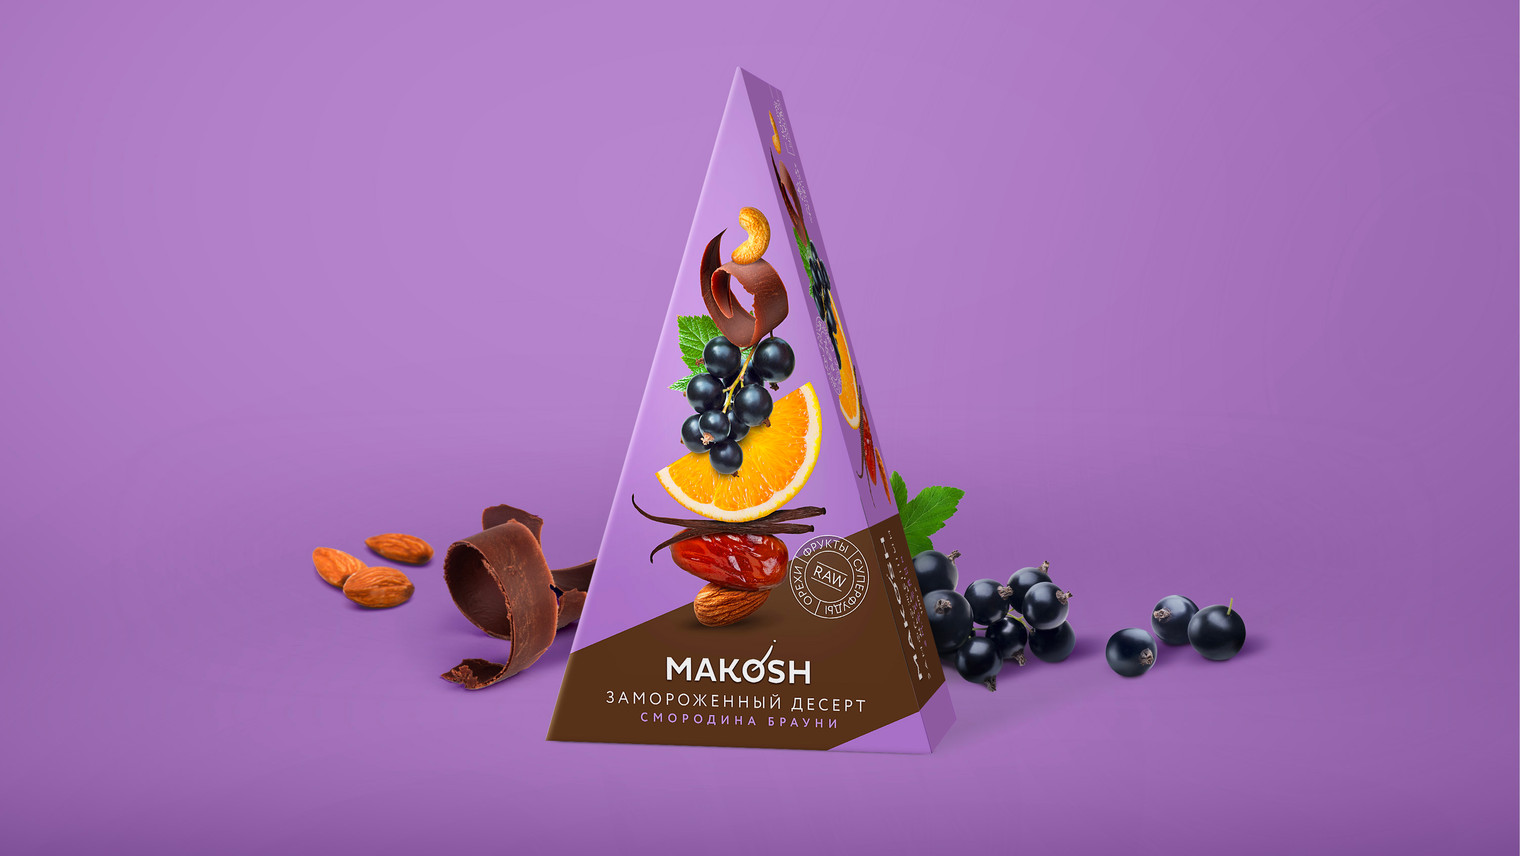 Macosh_prez_01_blackcurrant_purple.jpg